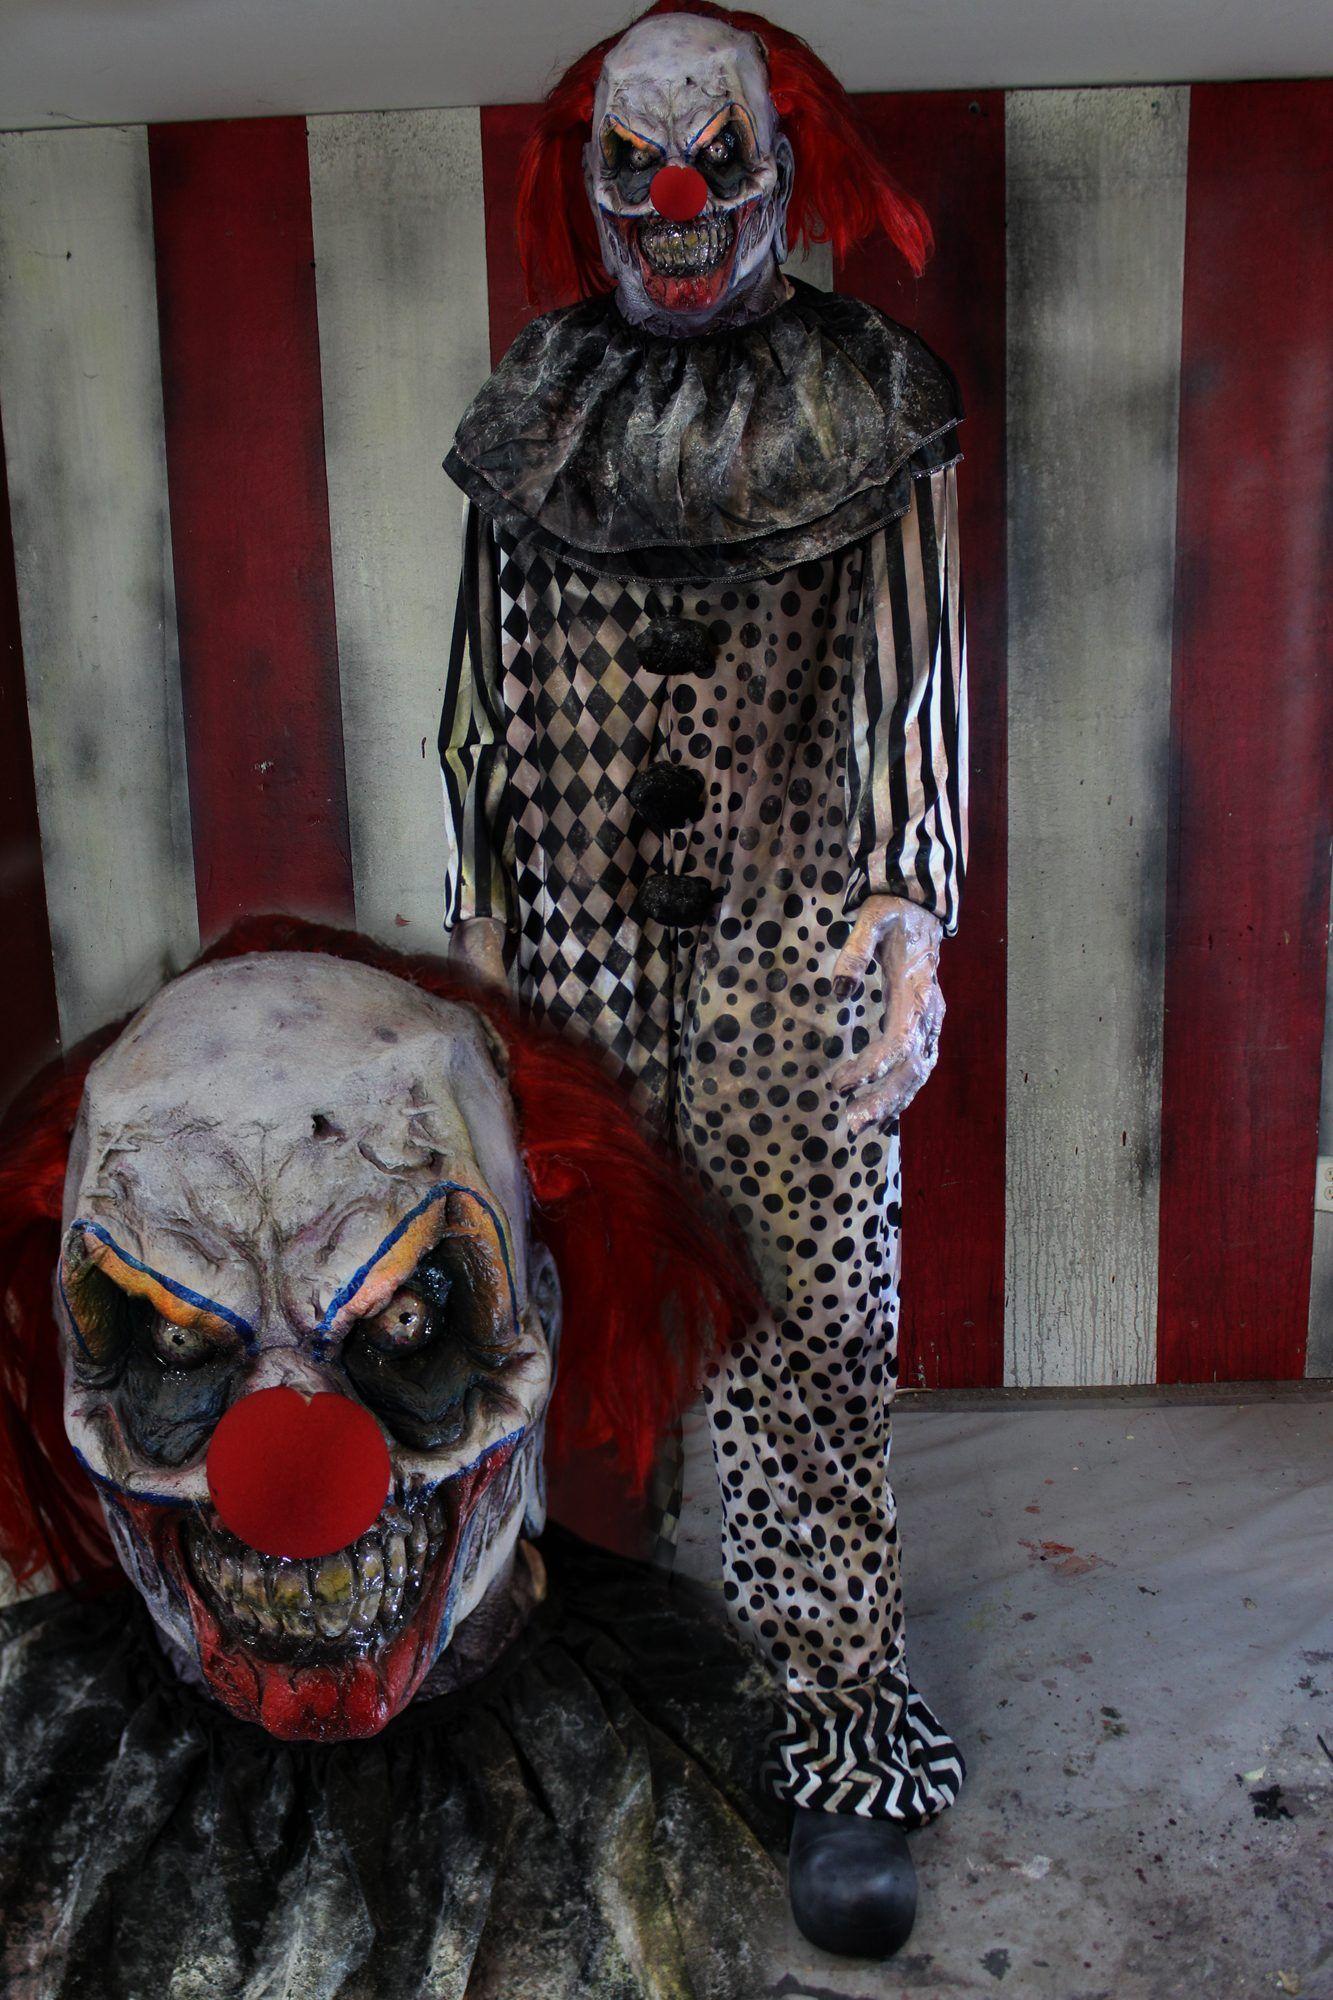 Delightful NEW 2017 Haunted House Halloween Props   Creepy Collection Haunted House U0026  Halloween Props